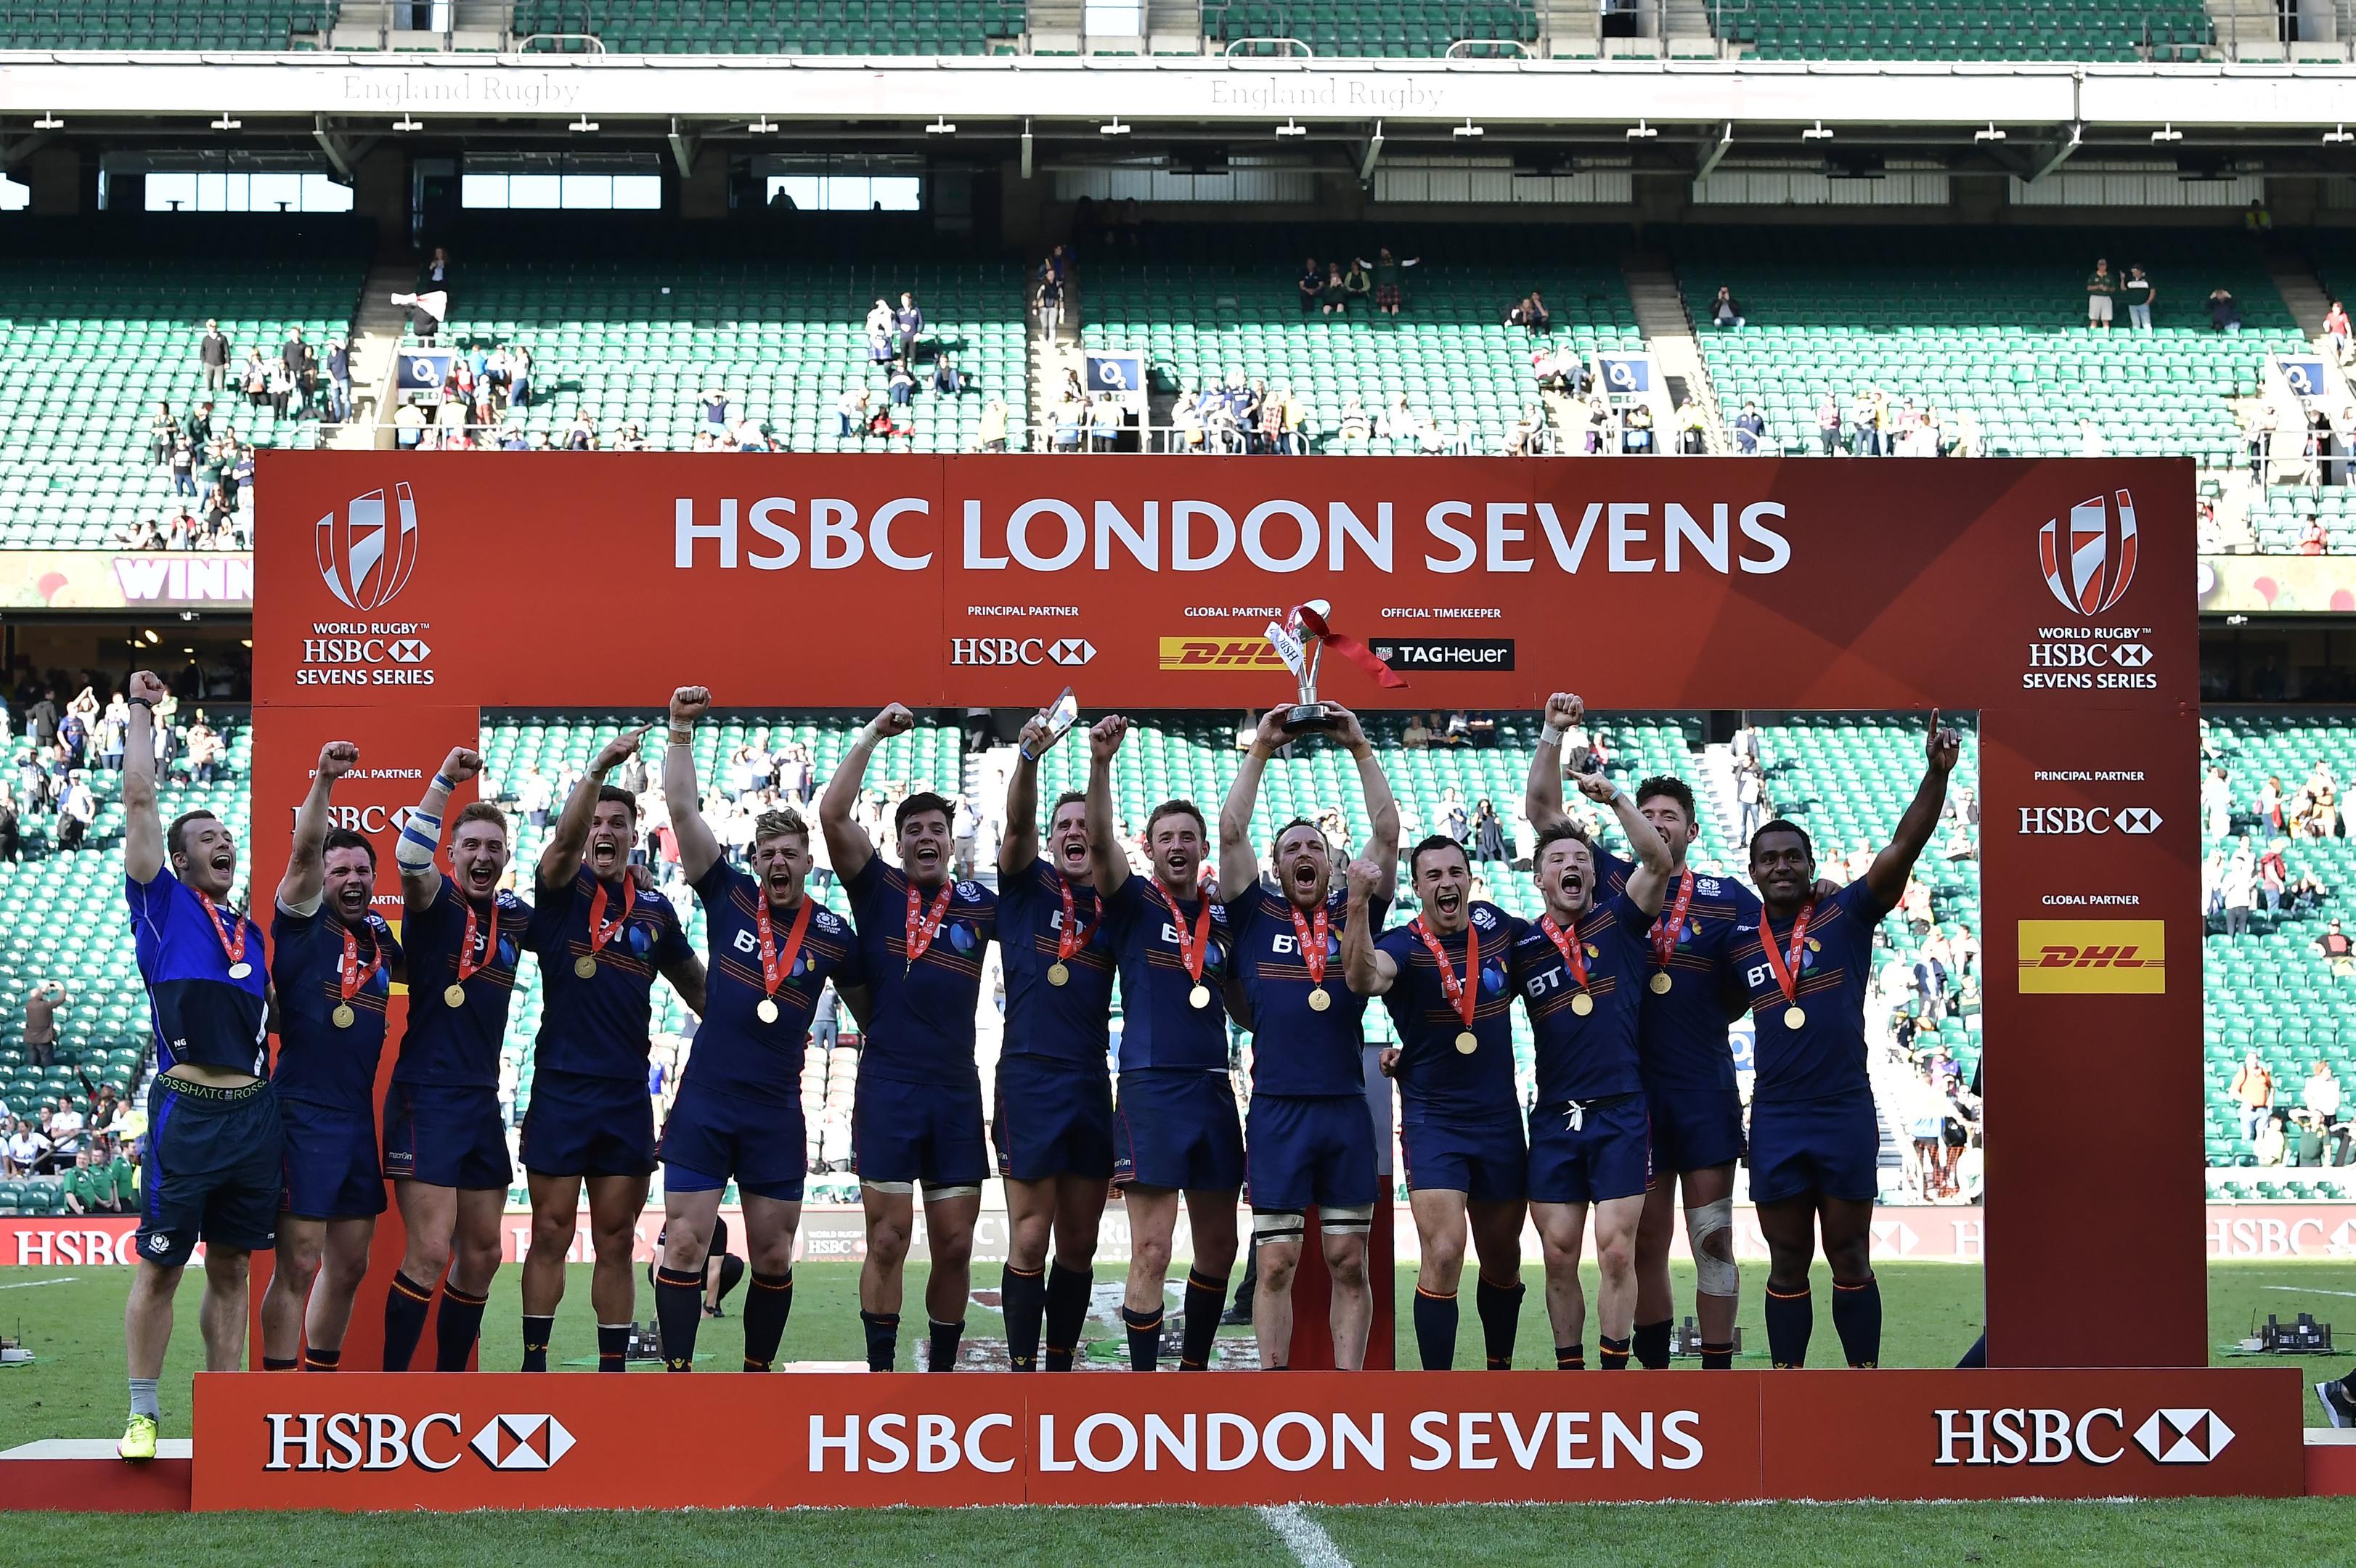 Scotland celebrate after winning the HSBC London Sevens tournament at Twickenham.